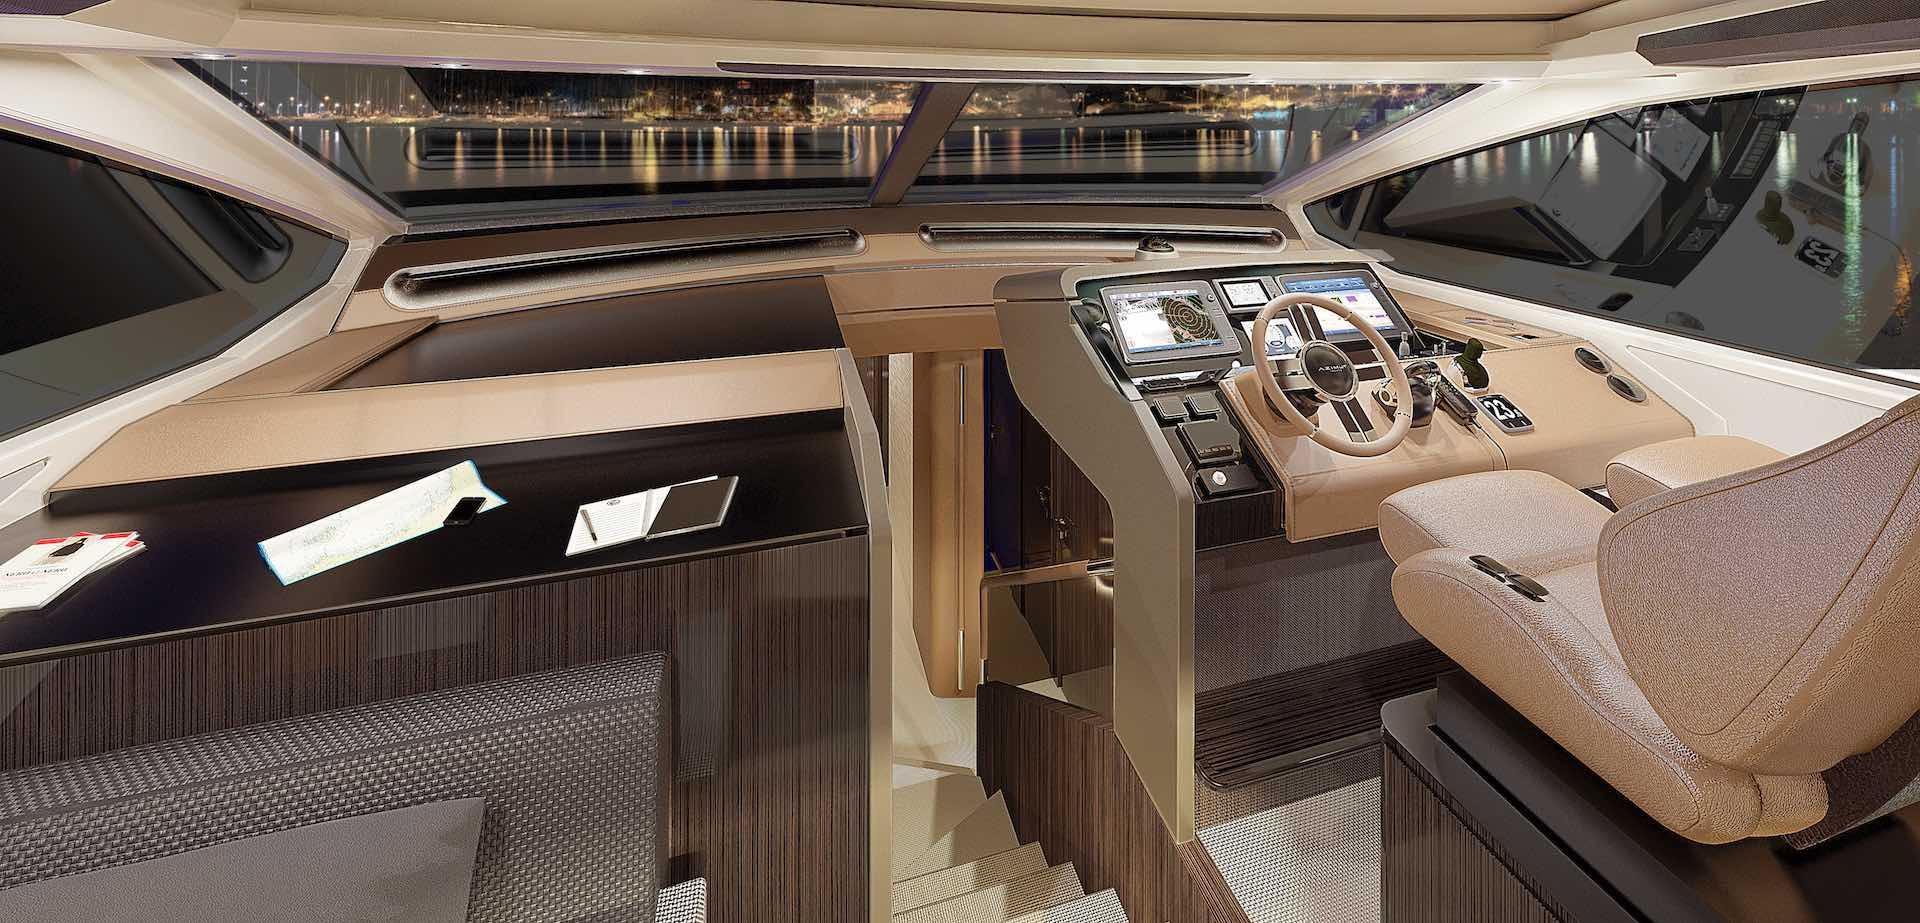 Inside Tiger Woods' $20m yacht